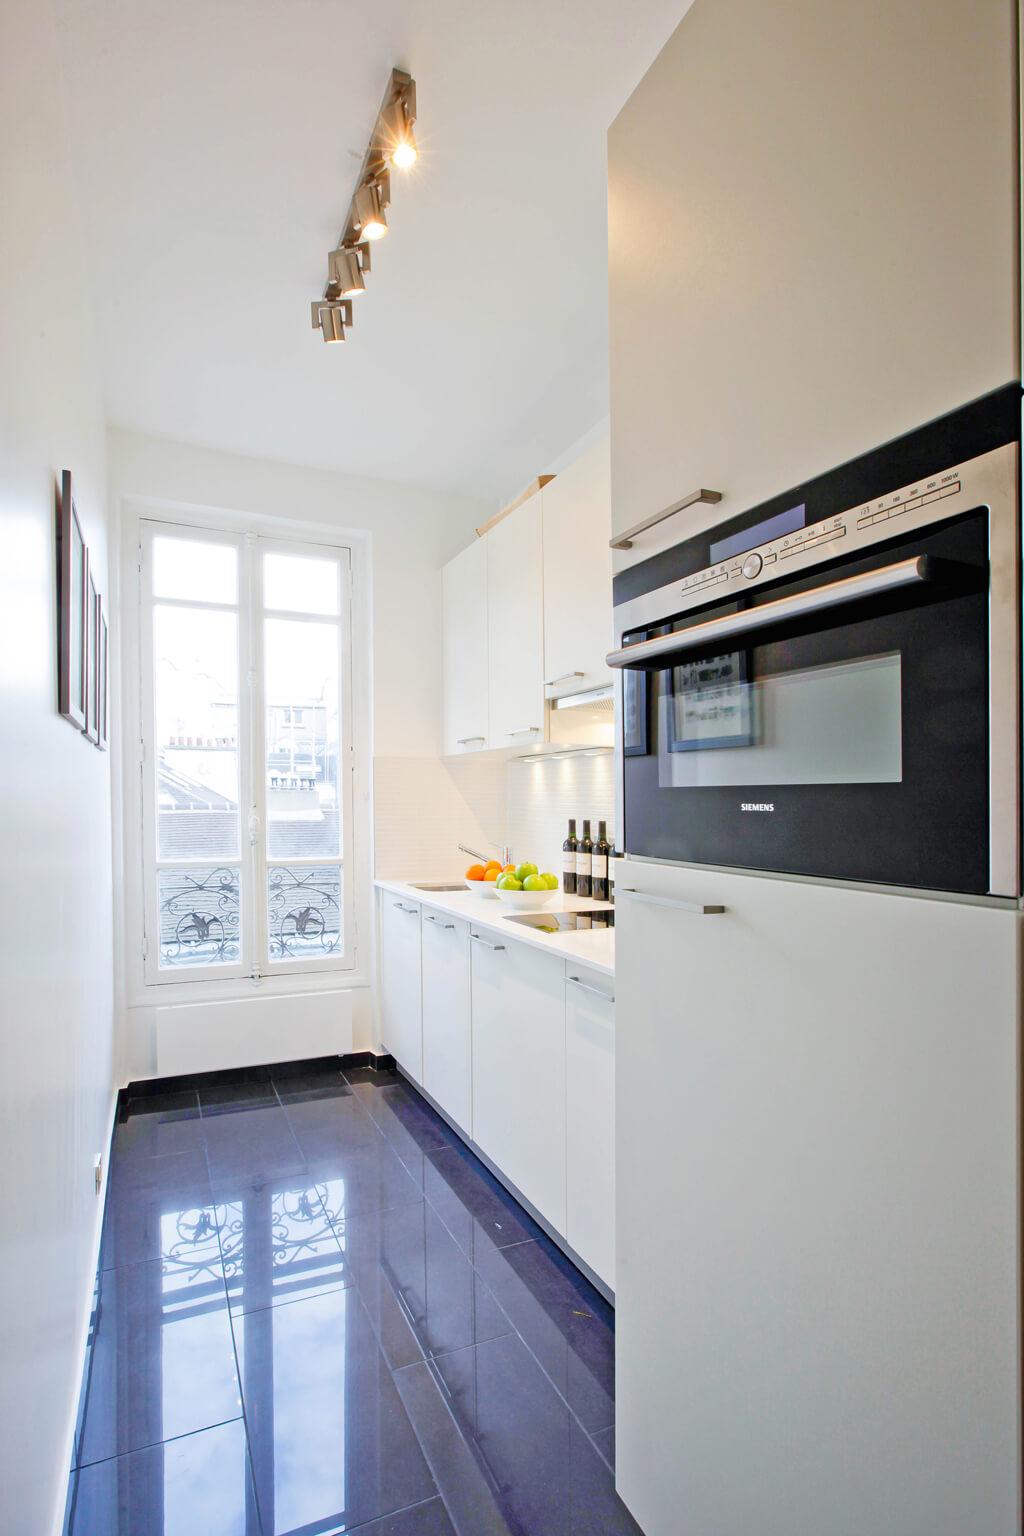 Paris Vacation Apartment Rental | Notre Dame | Haven in